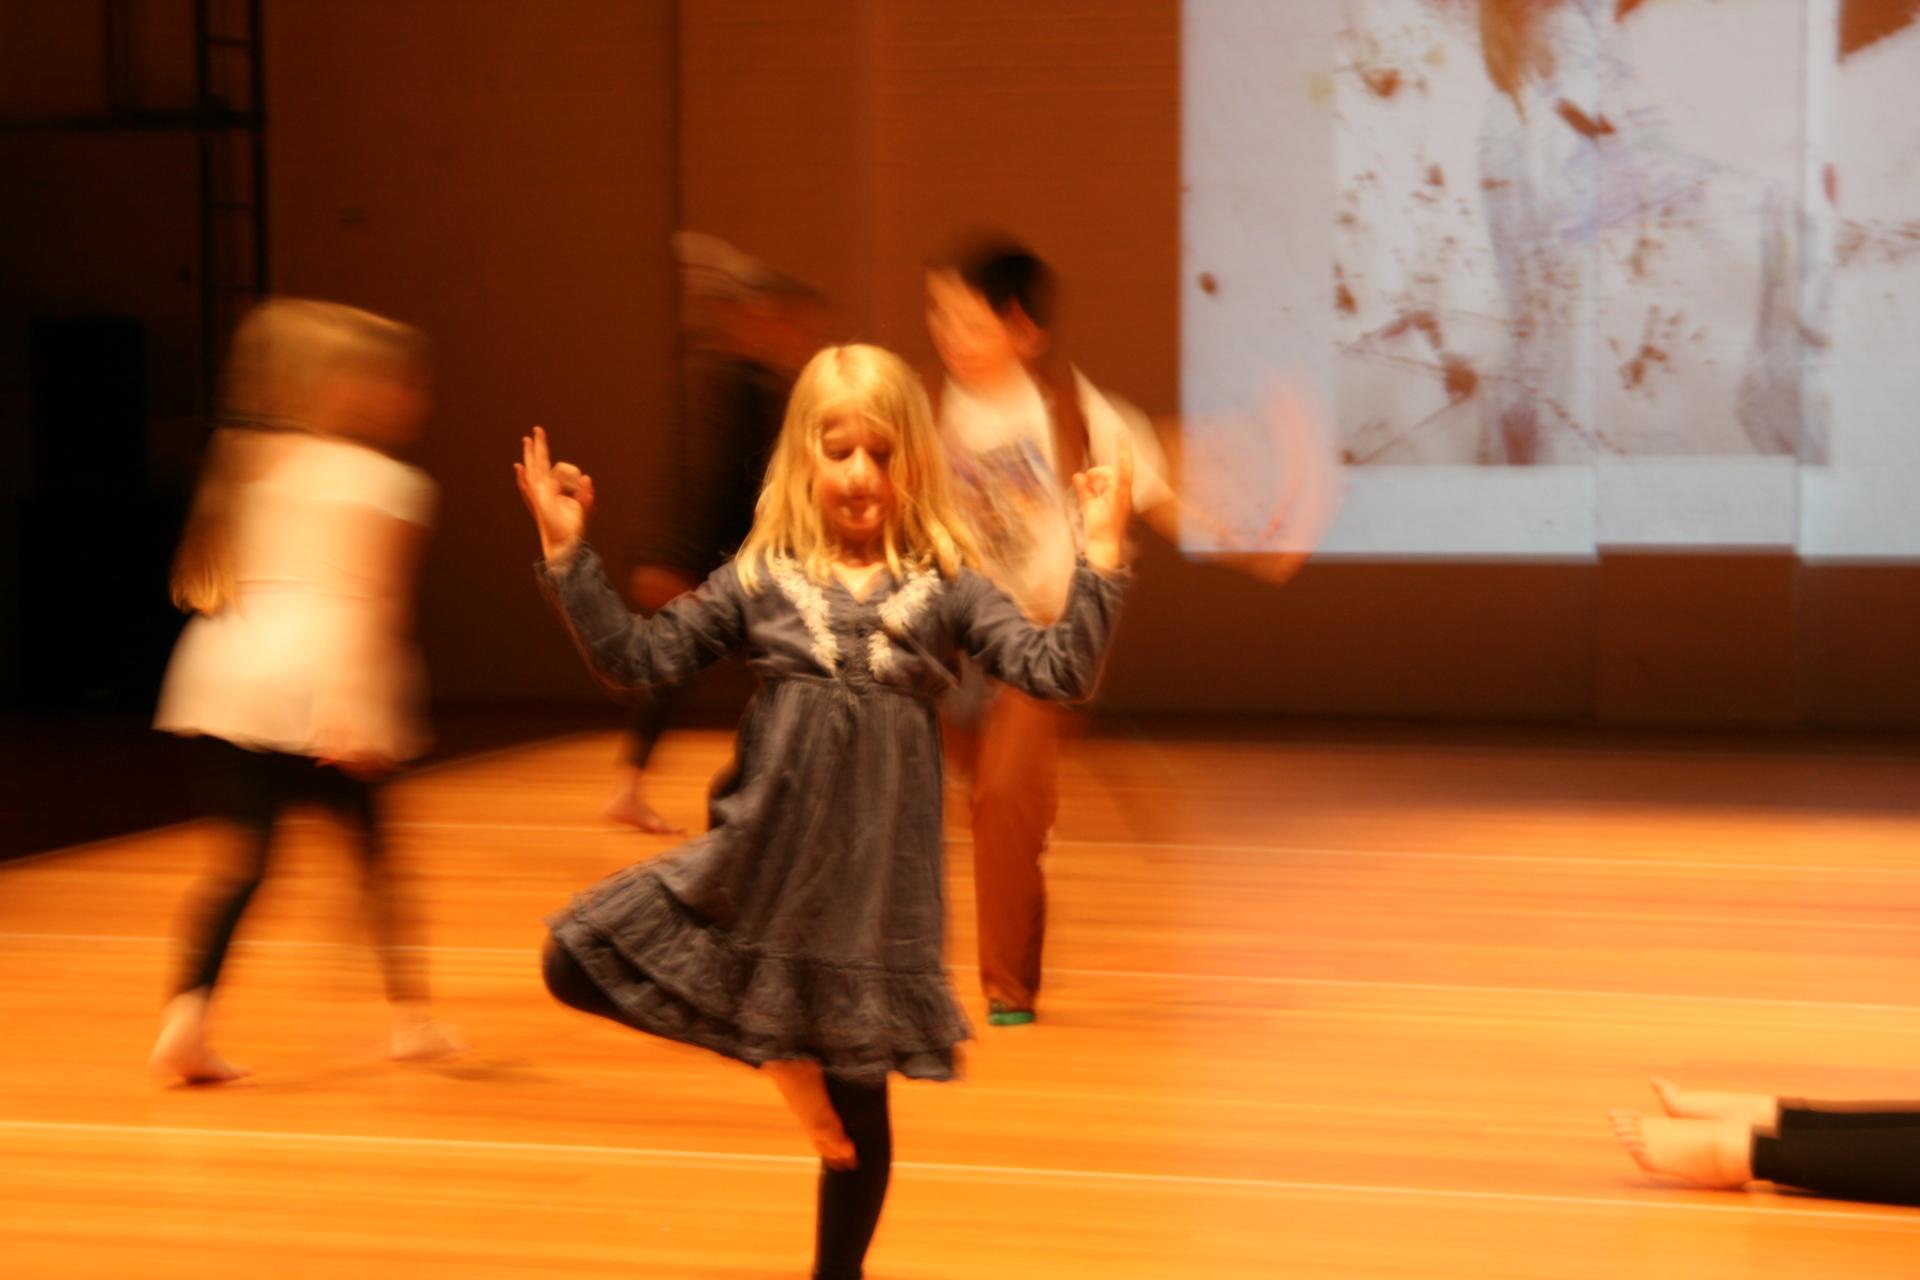 laboratorium haus 1 Lydia Müller – Tanz/Choreographie – chance tanz